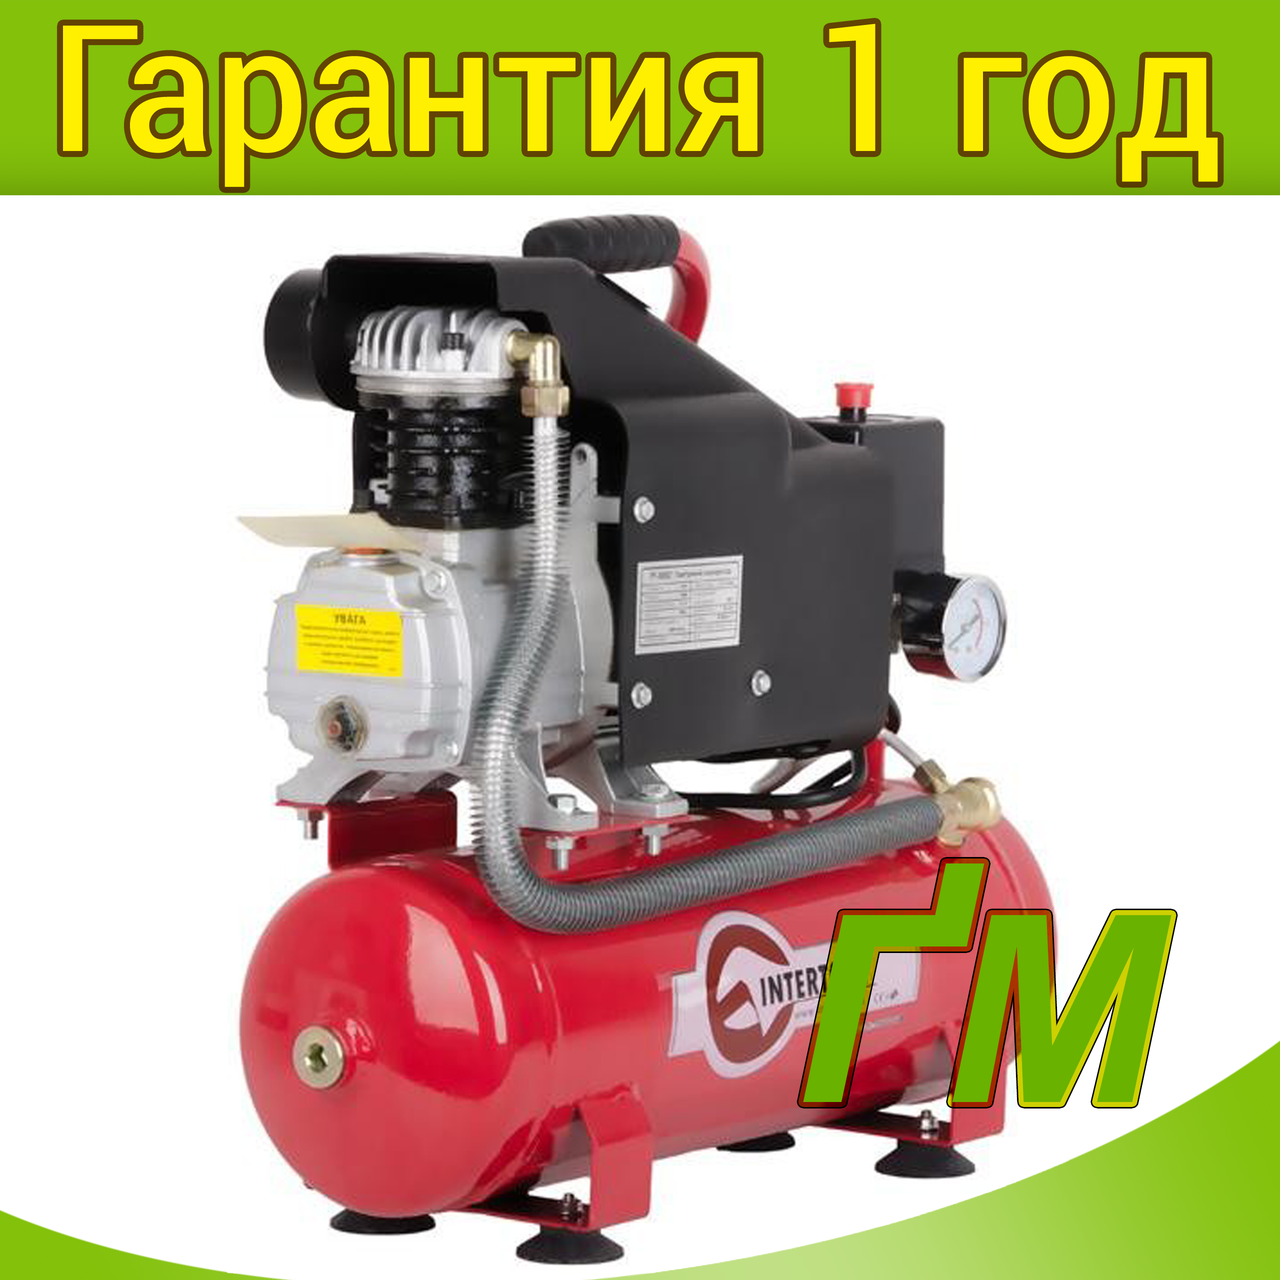 Компрессор INTERTOOL PT-0002 9 л, 0.75 кВт, 220 В, 8 атм, 160 л/мин.